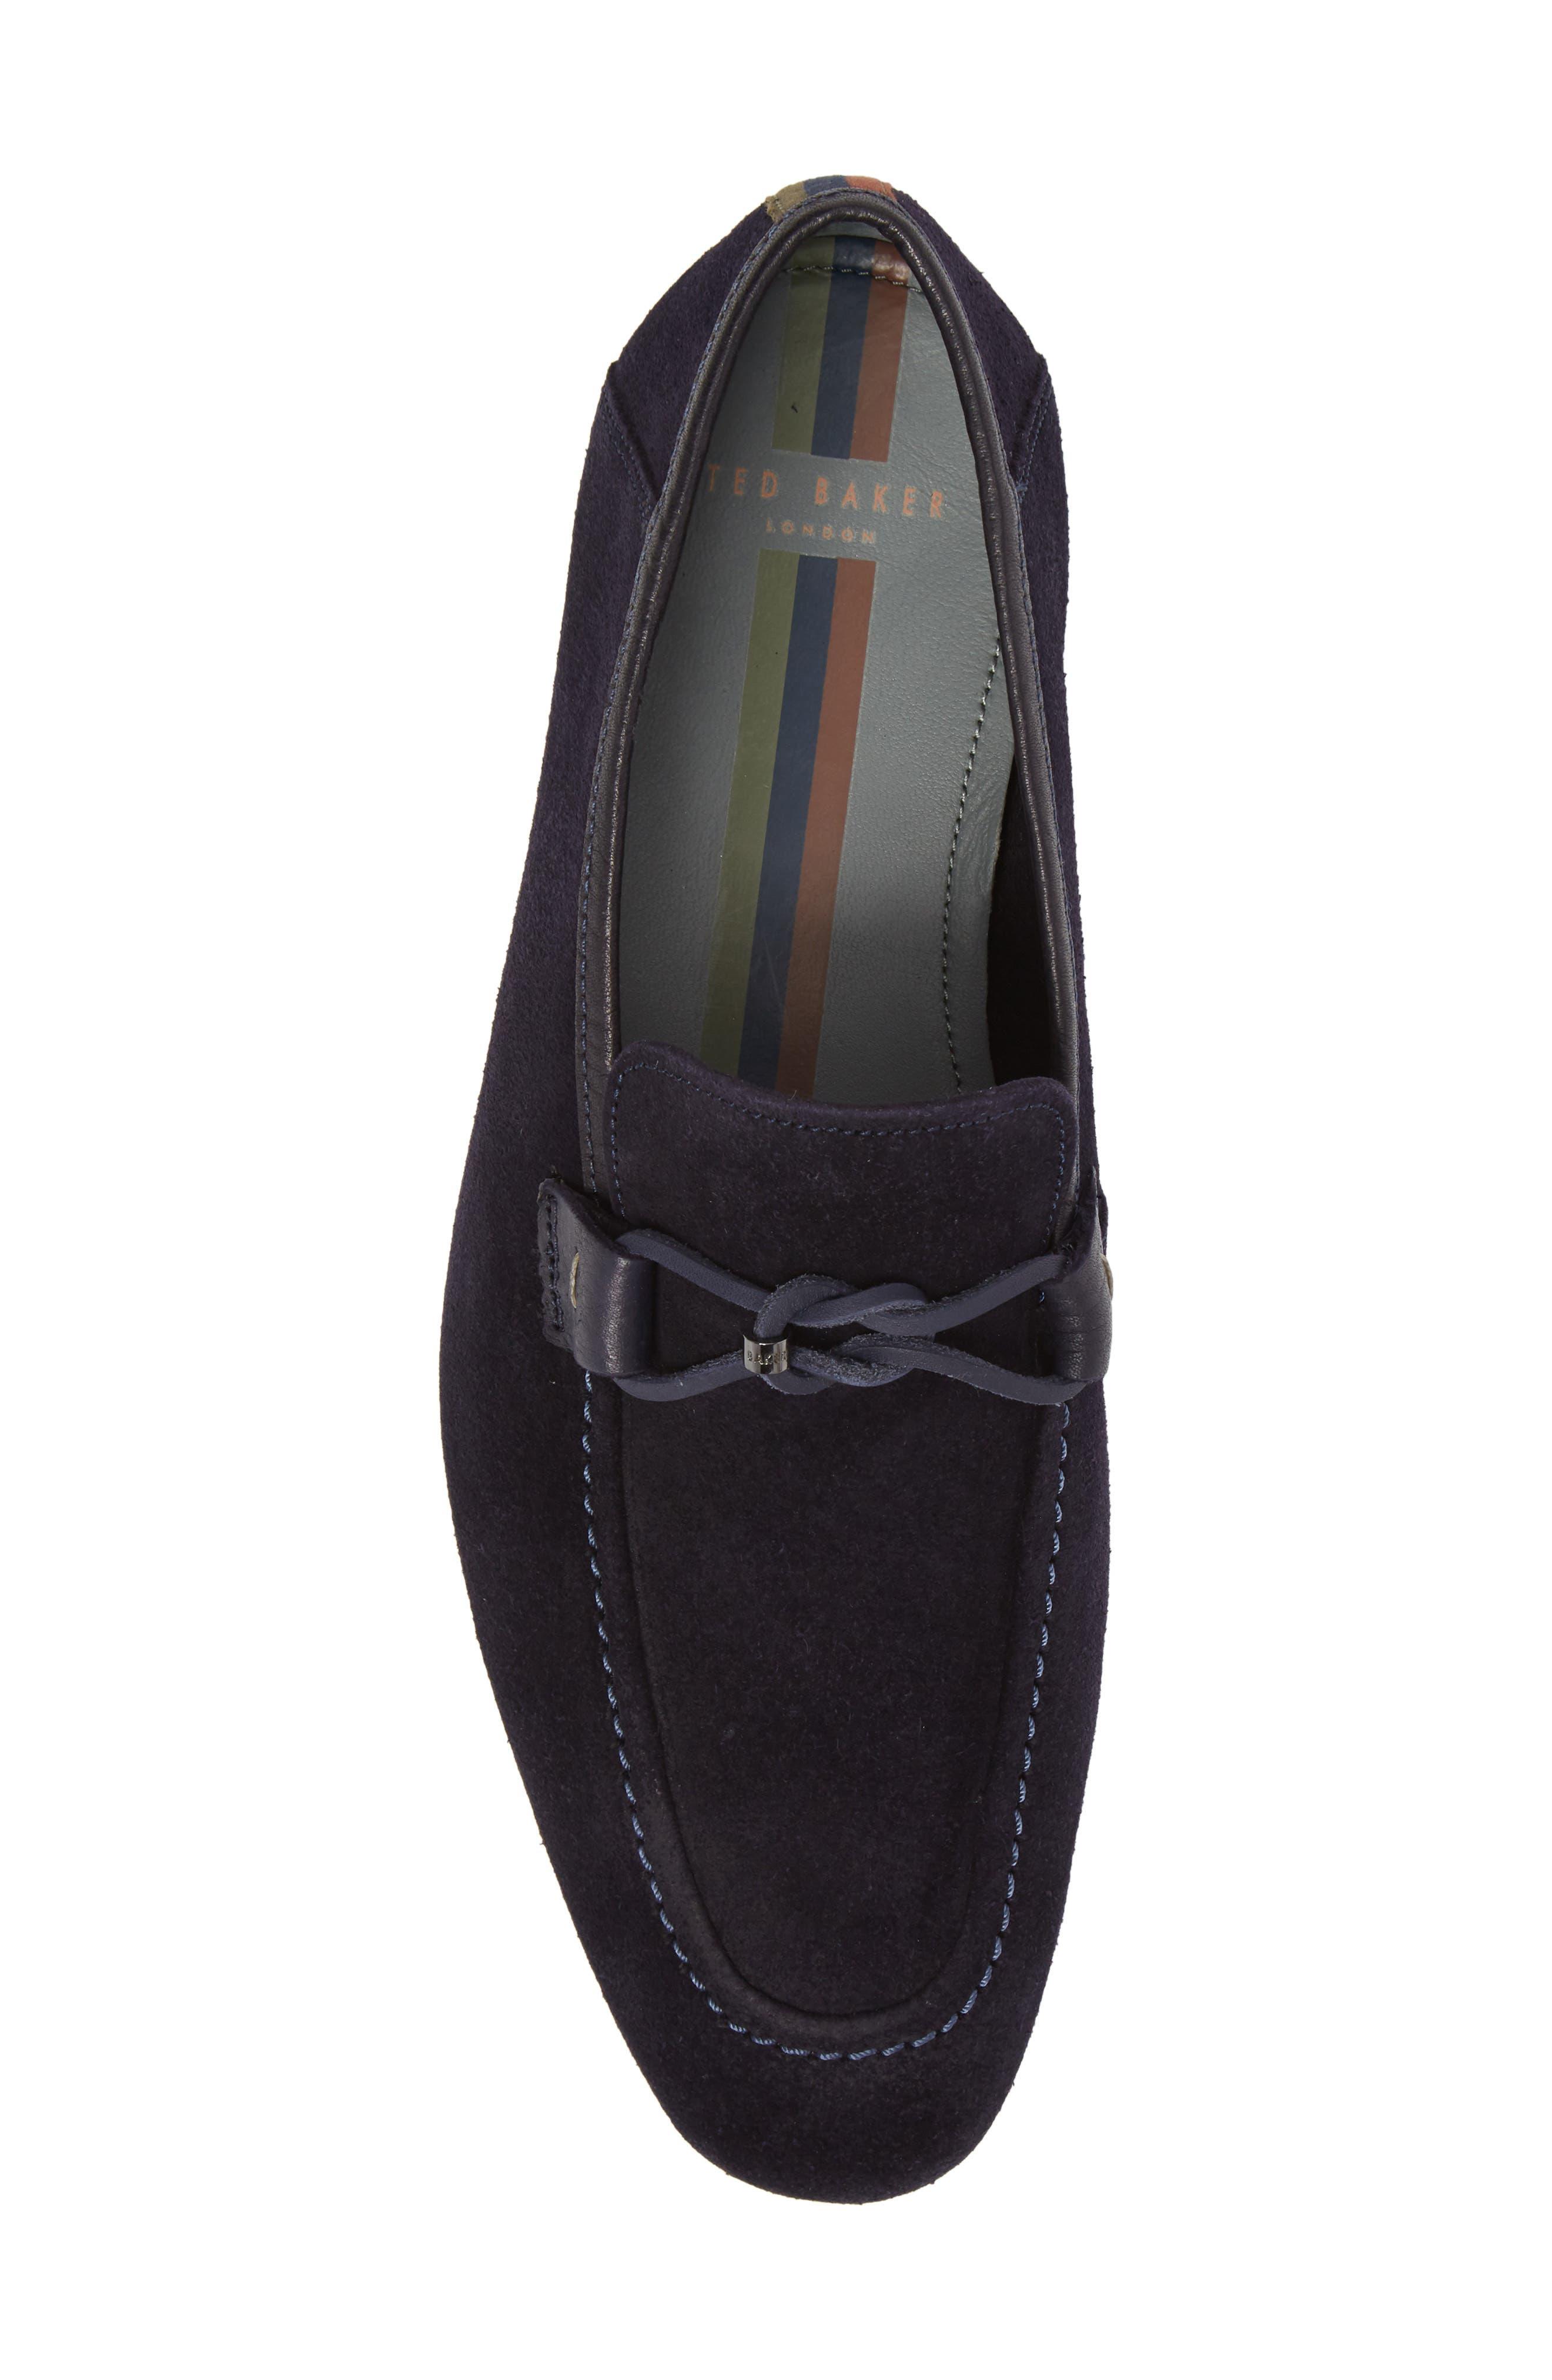 Hoppken Convertible Knotted Loafer,                             Alternate thumbnail 5, color,                             Dark Blue Suede